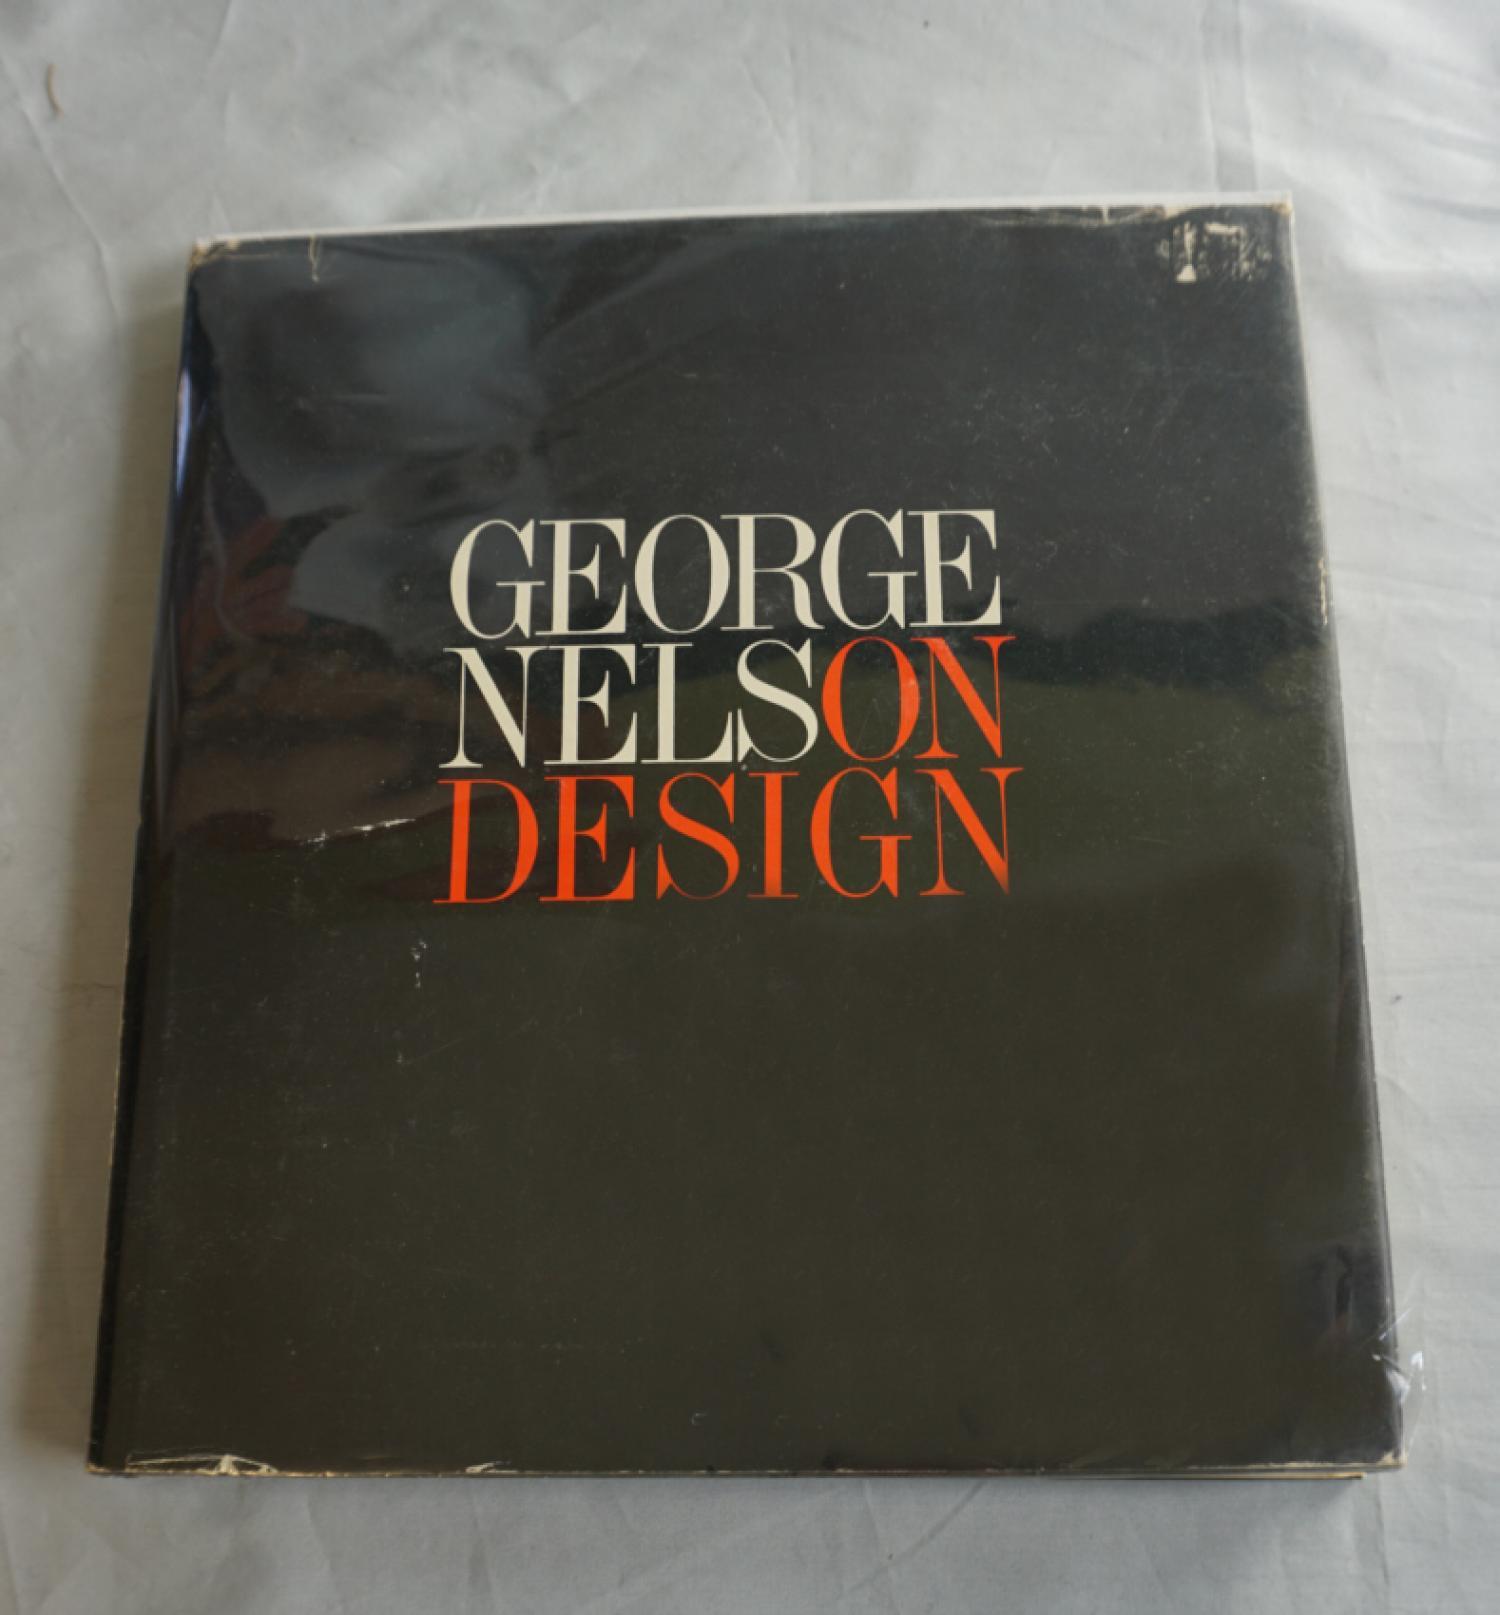 george nelson design book first edition 1979. Black Bedroom Furniture Sets. Home Design Ideas